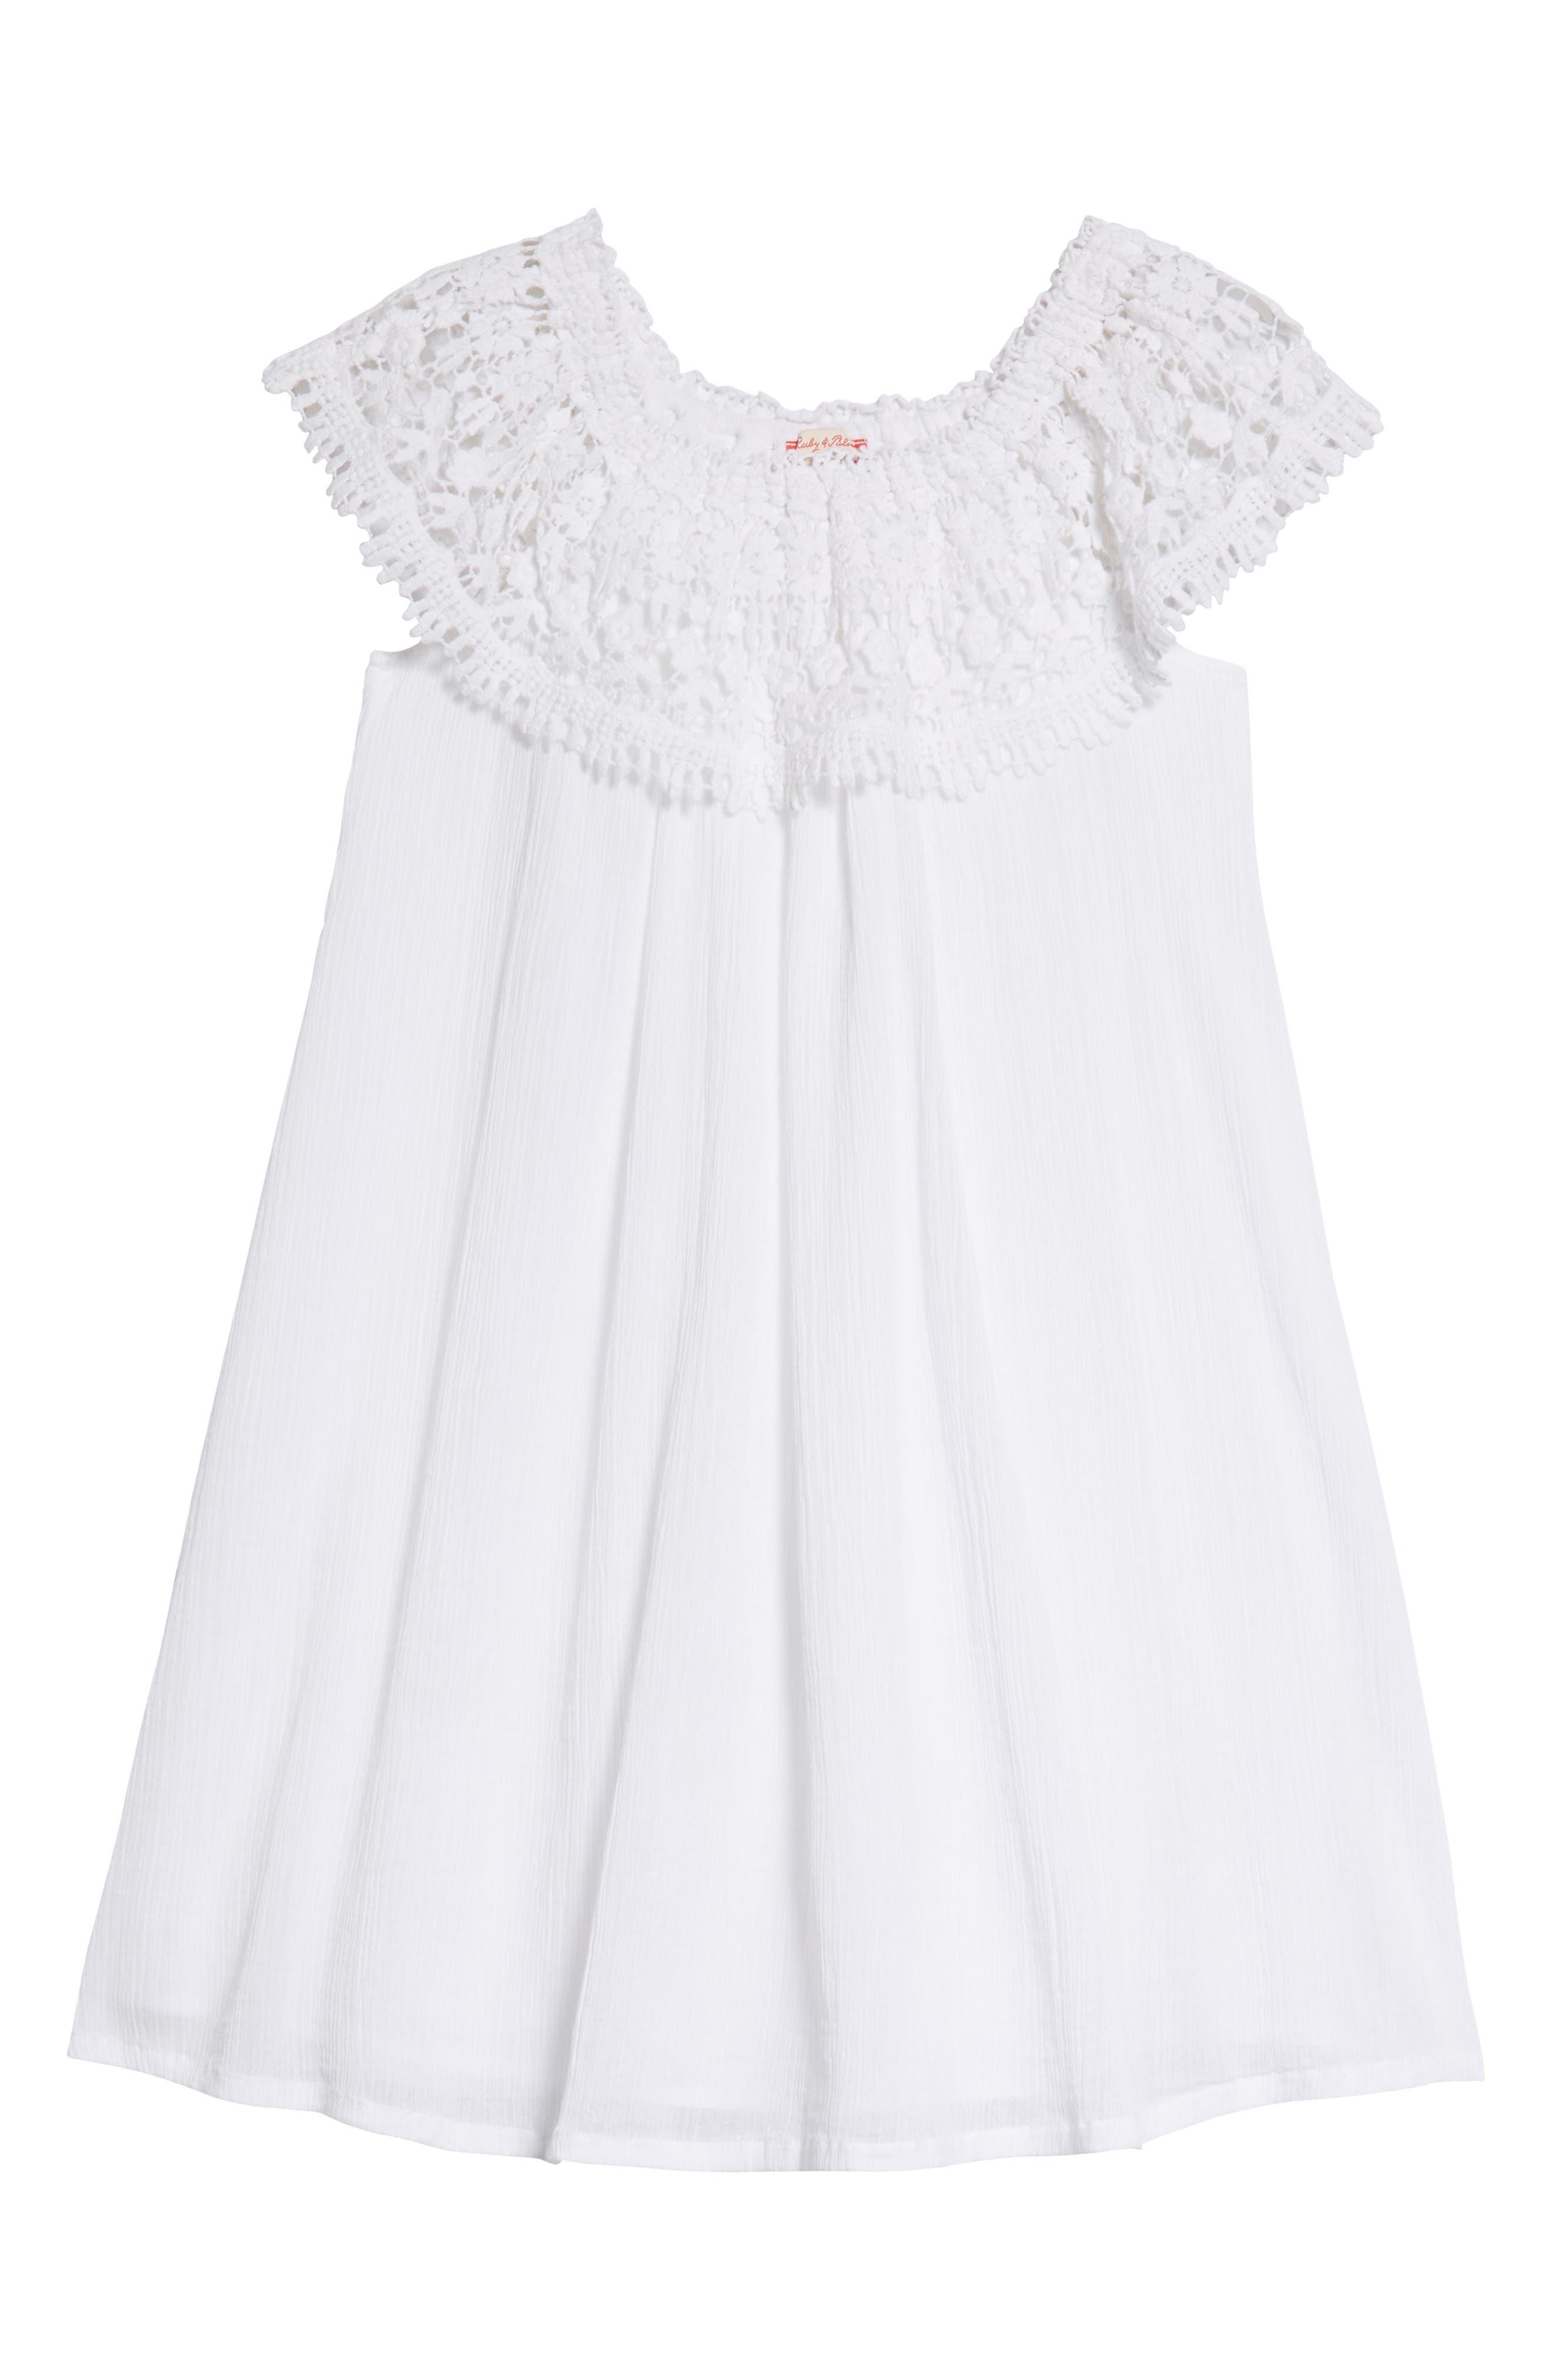 Lace Swing Dress,                             Main thumbnail 1, color,                             White